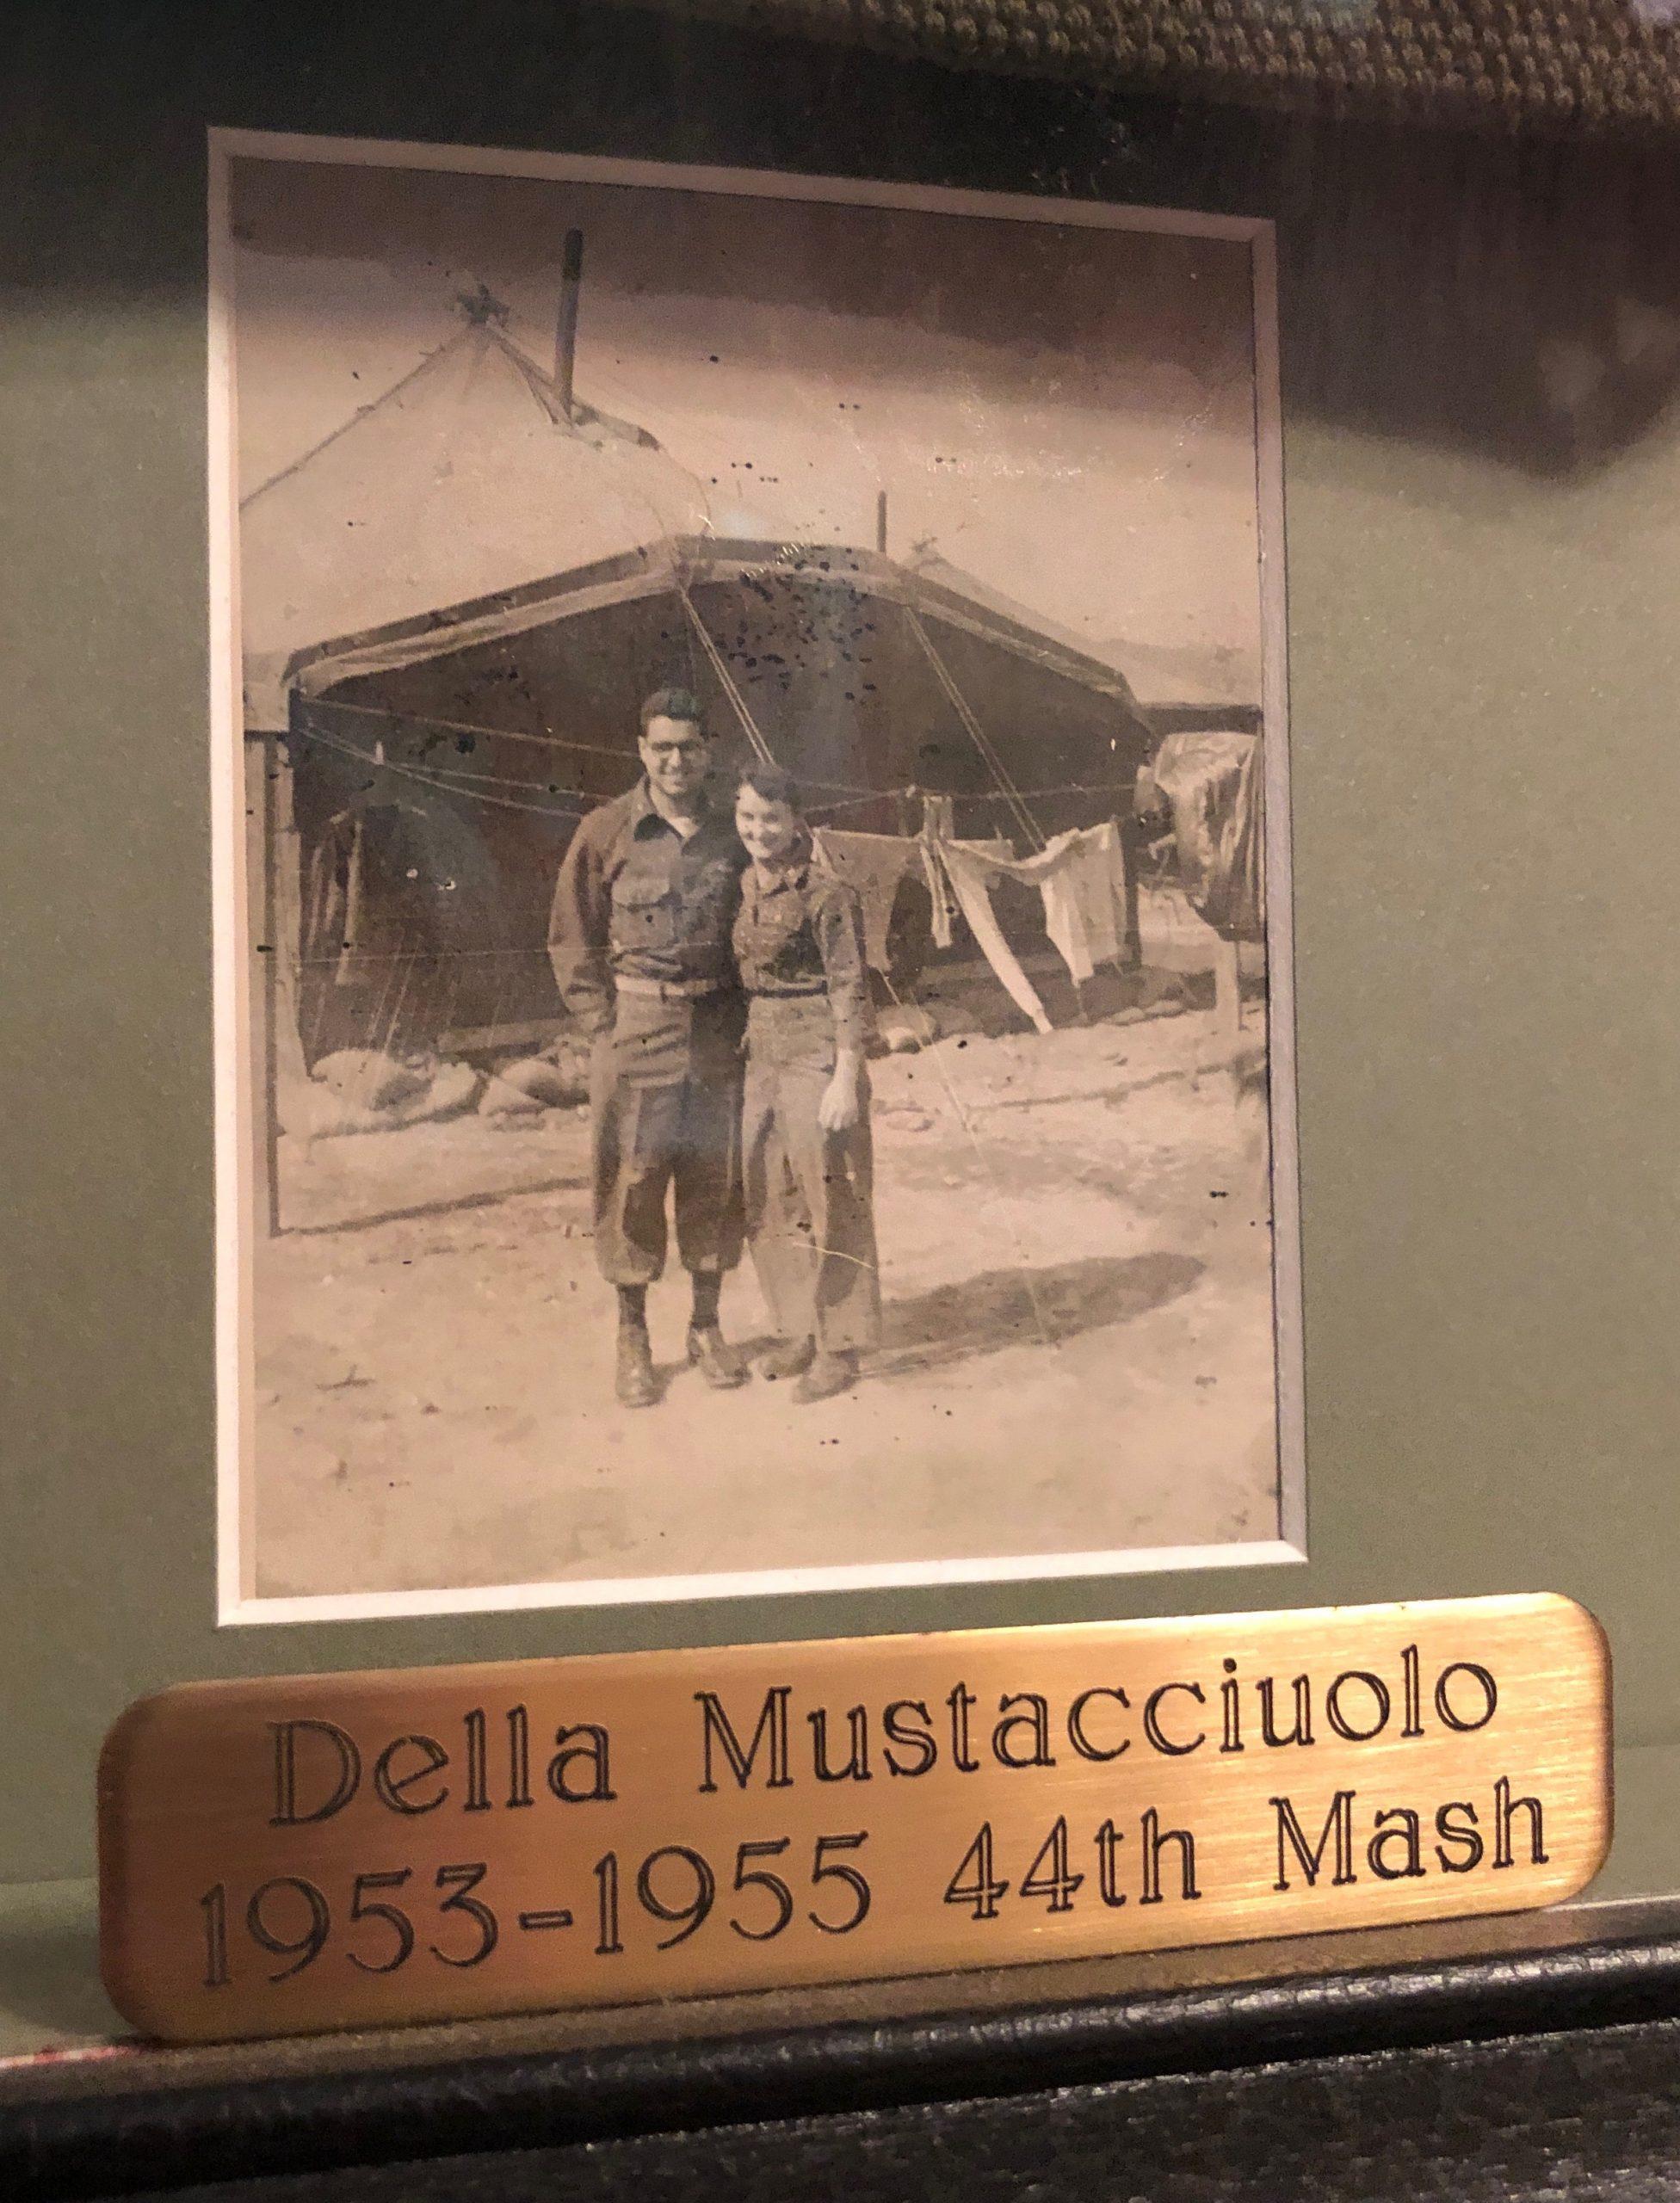 Sam and Della serving together at the 44th MASH